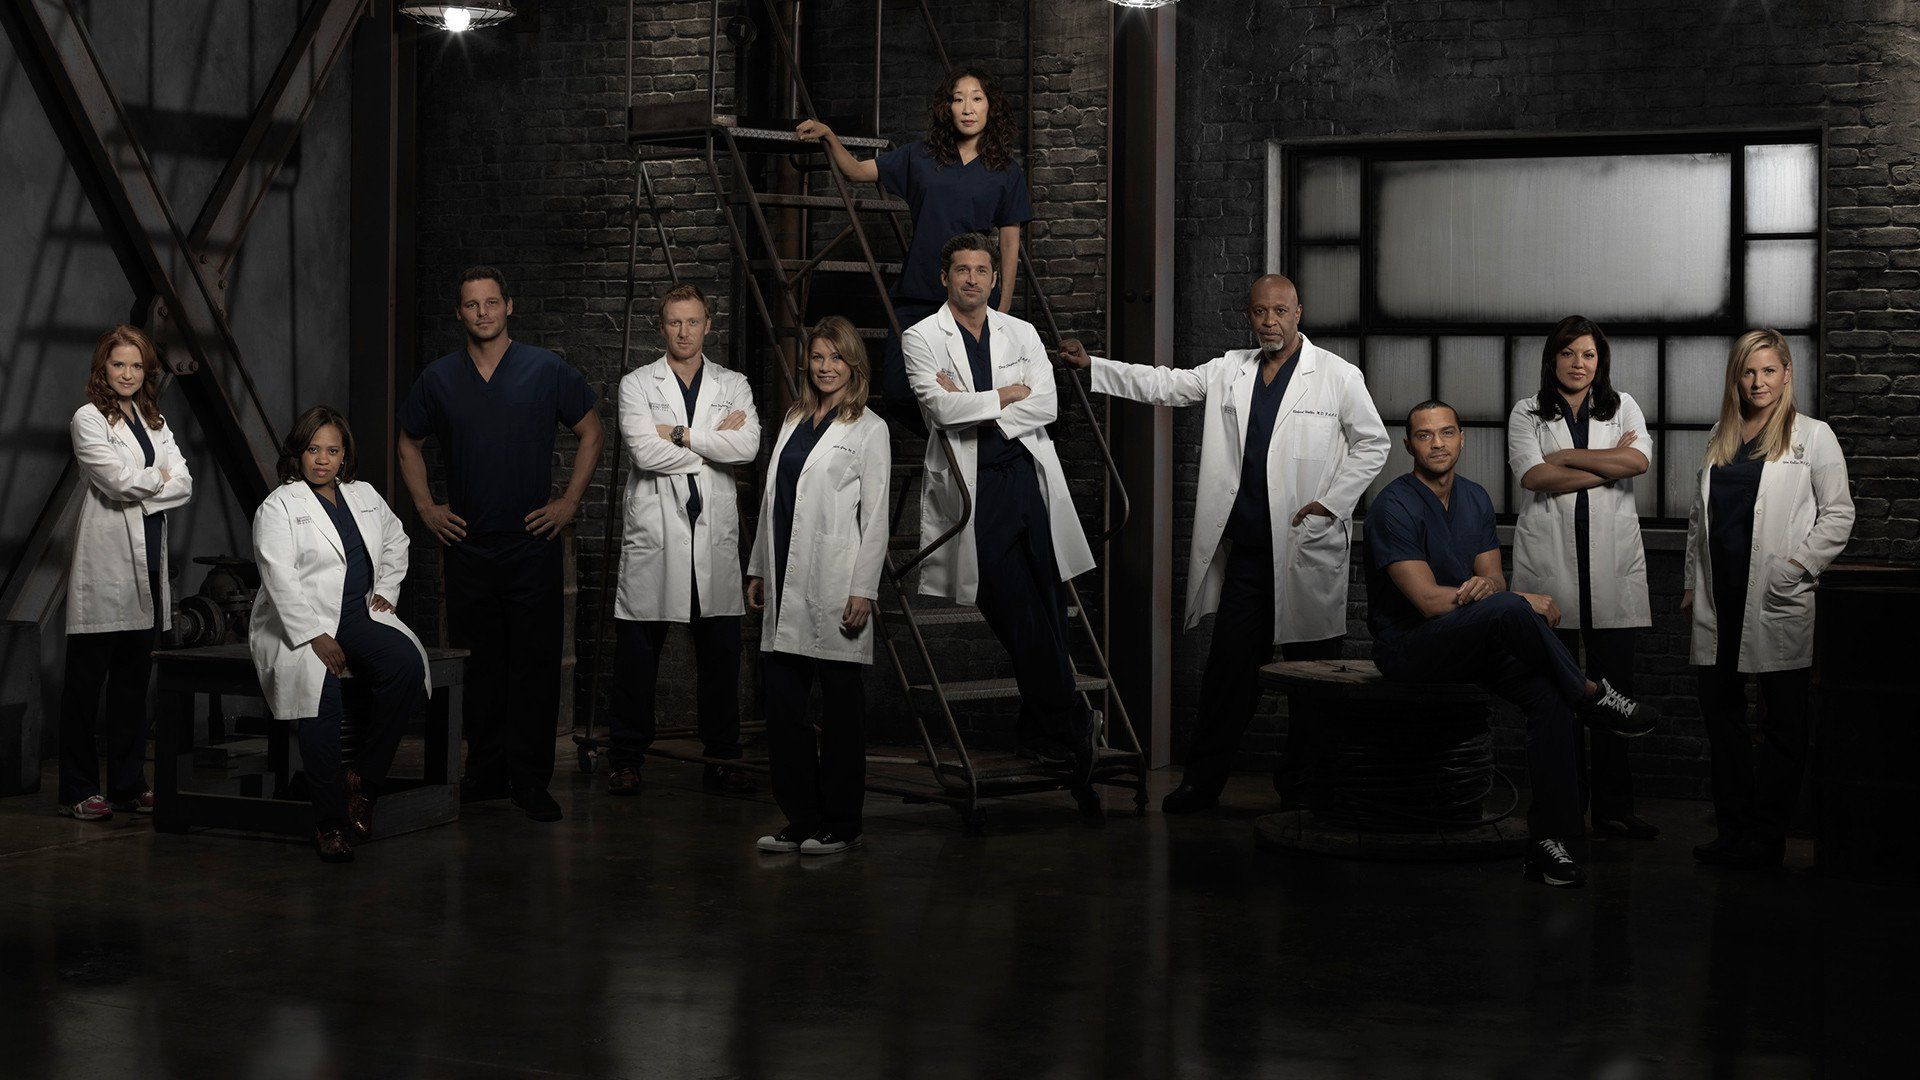 Fullwatch Greys Anatomy Season 14 Episode 7 Who Lives Who